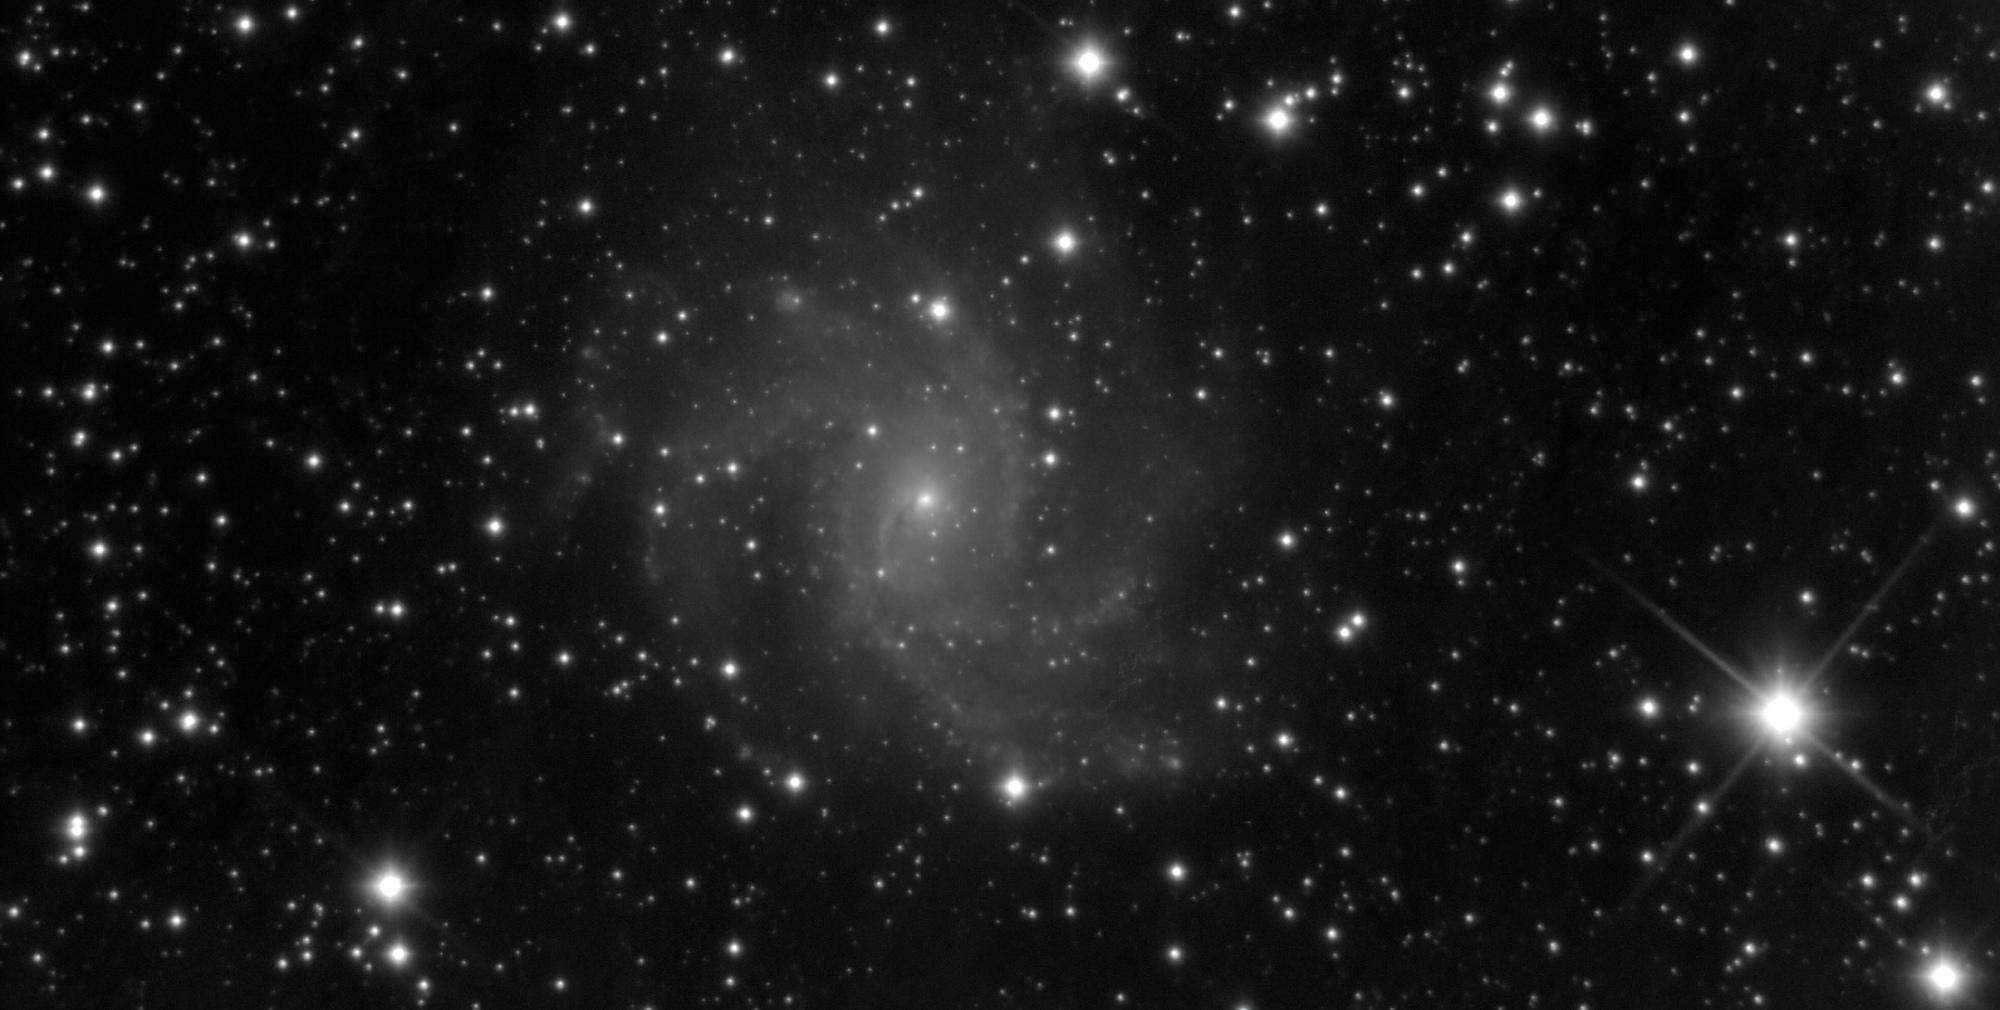 NGC6946-denoiselow-light.thumb.jpg.3e794e510fdbf7c067b0f69ab0a775d0.jpg